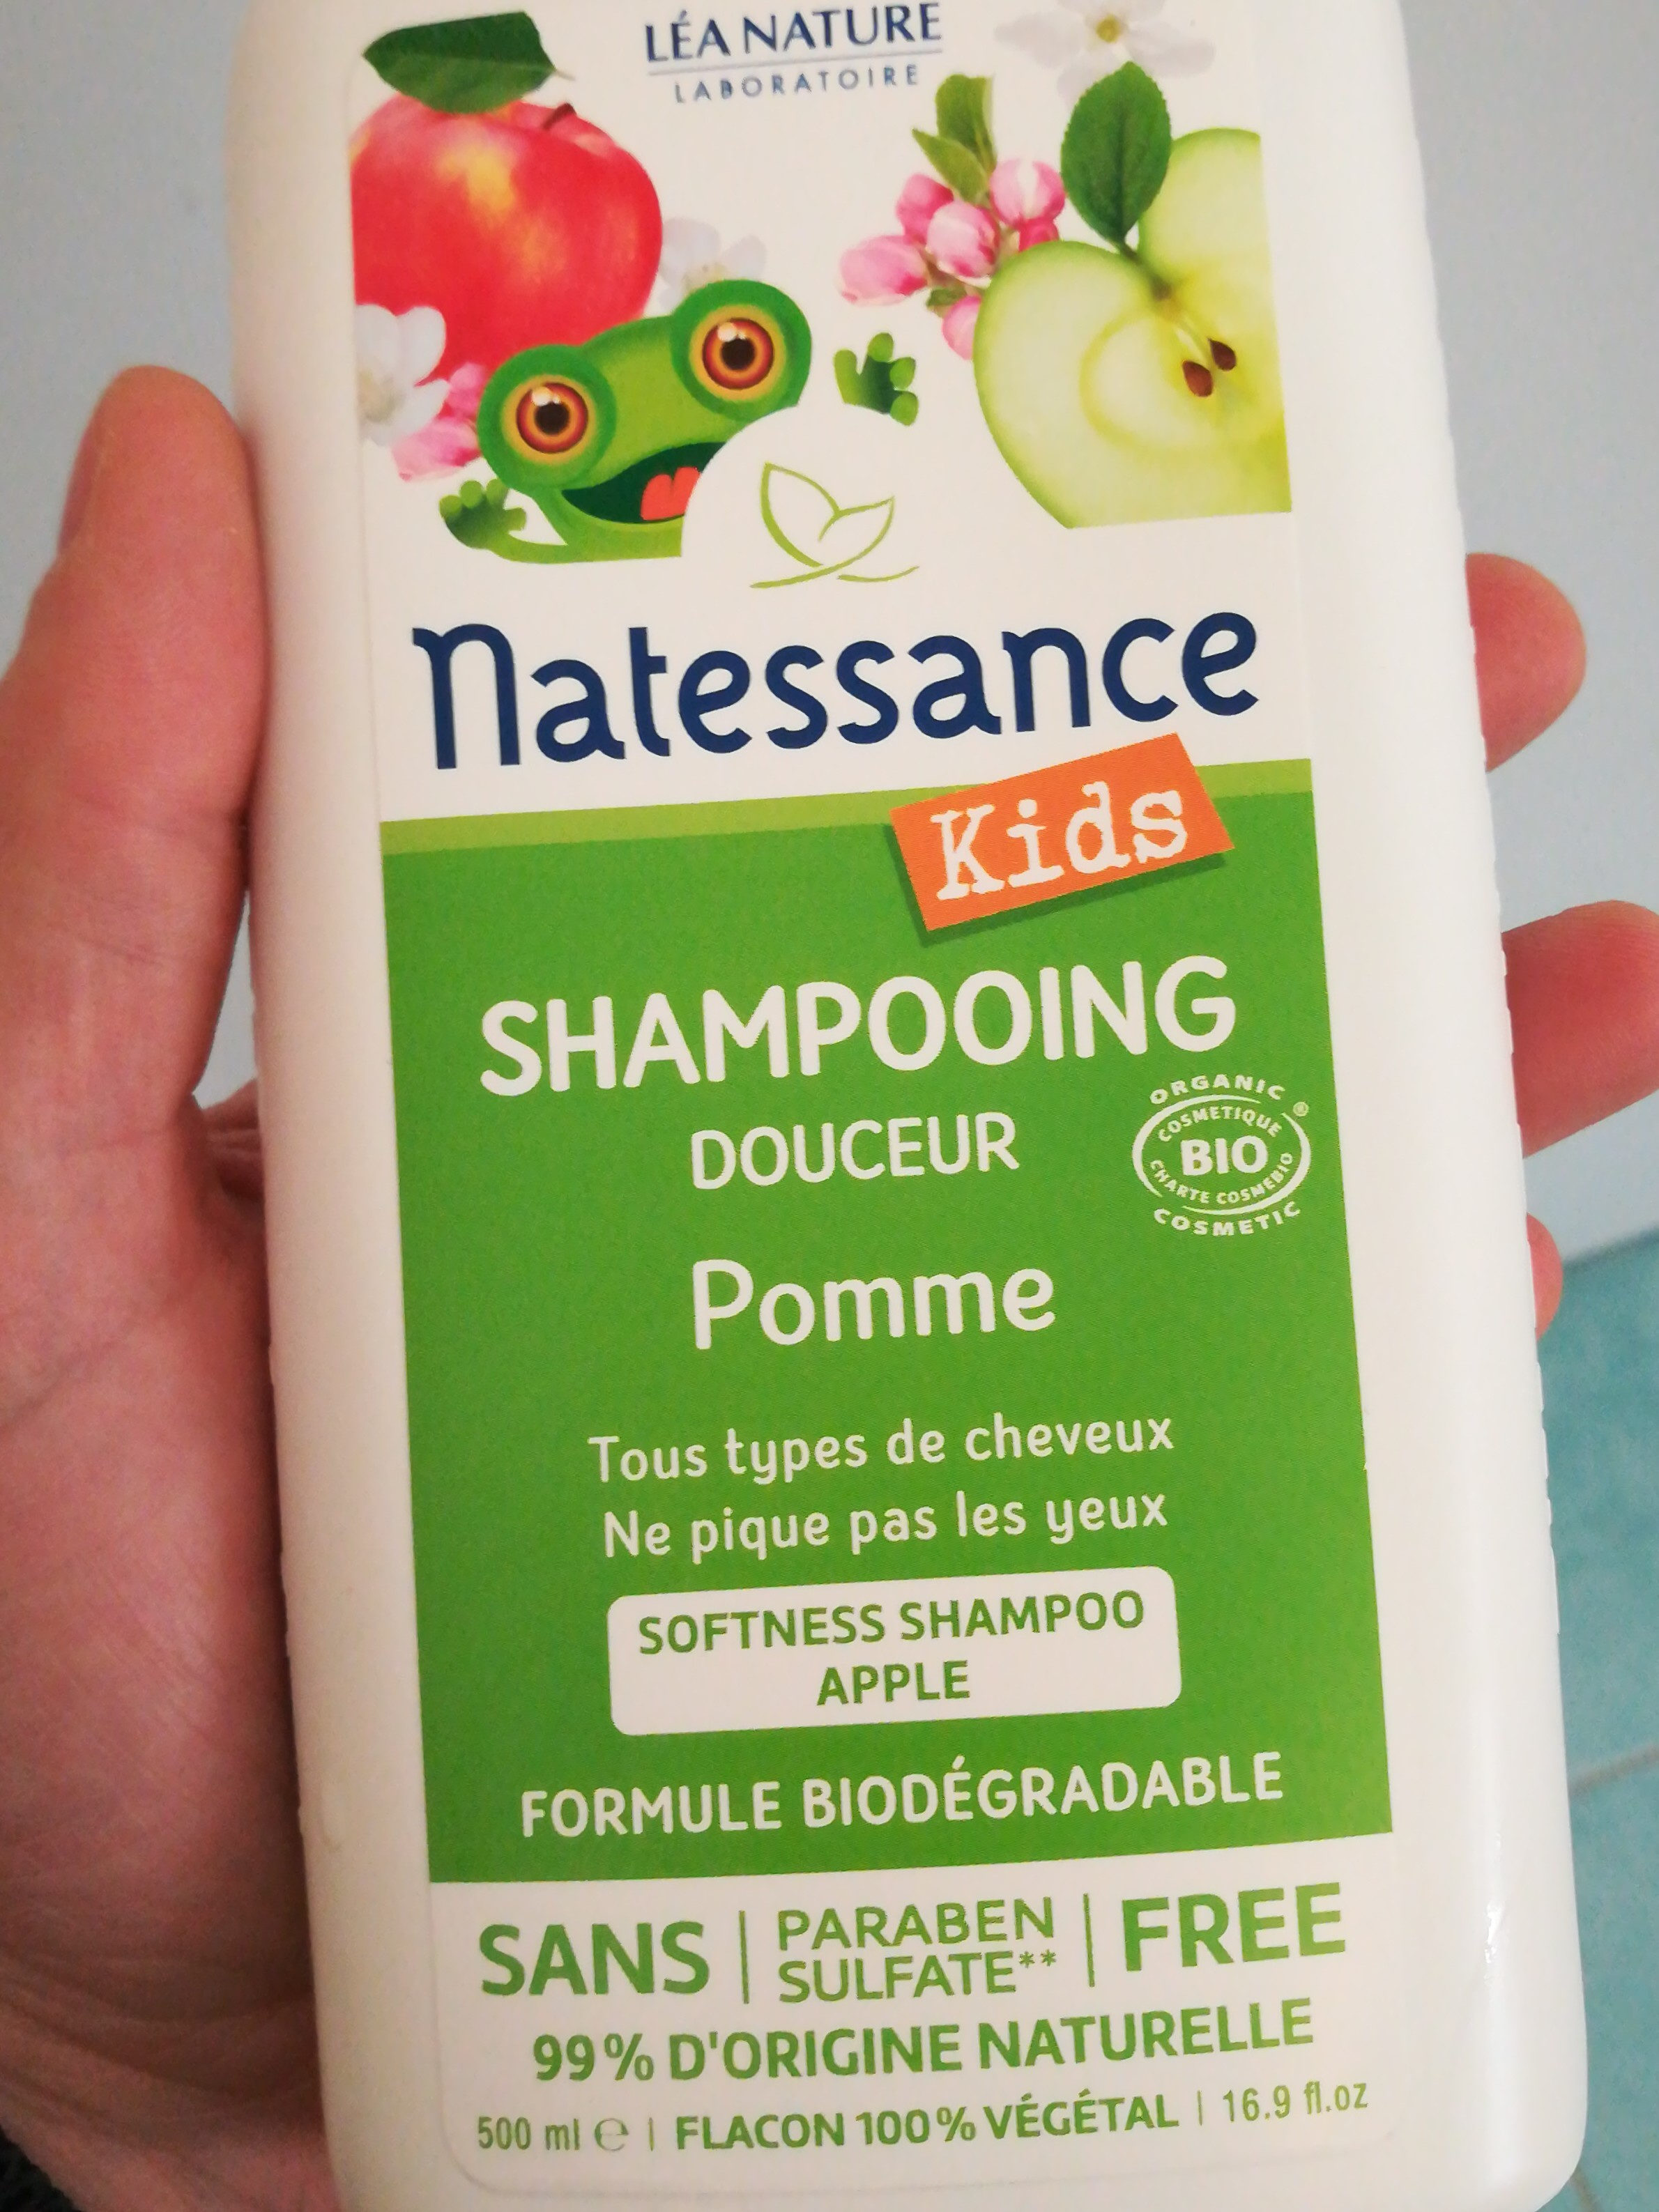 natessance kids shampooing douceur - Product - fr